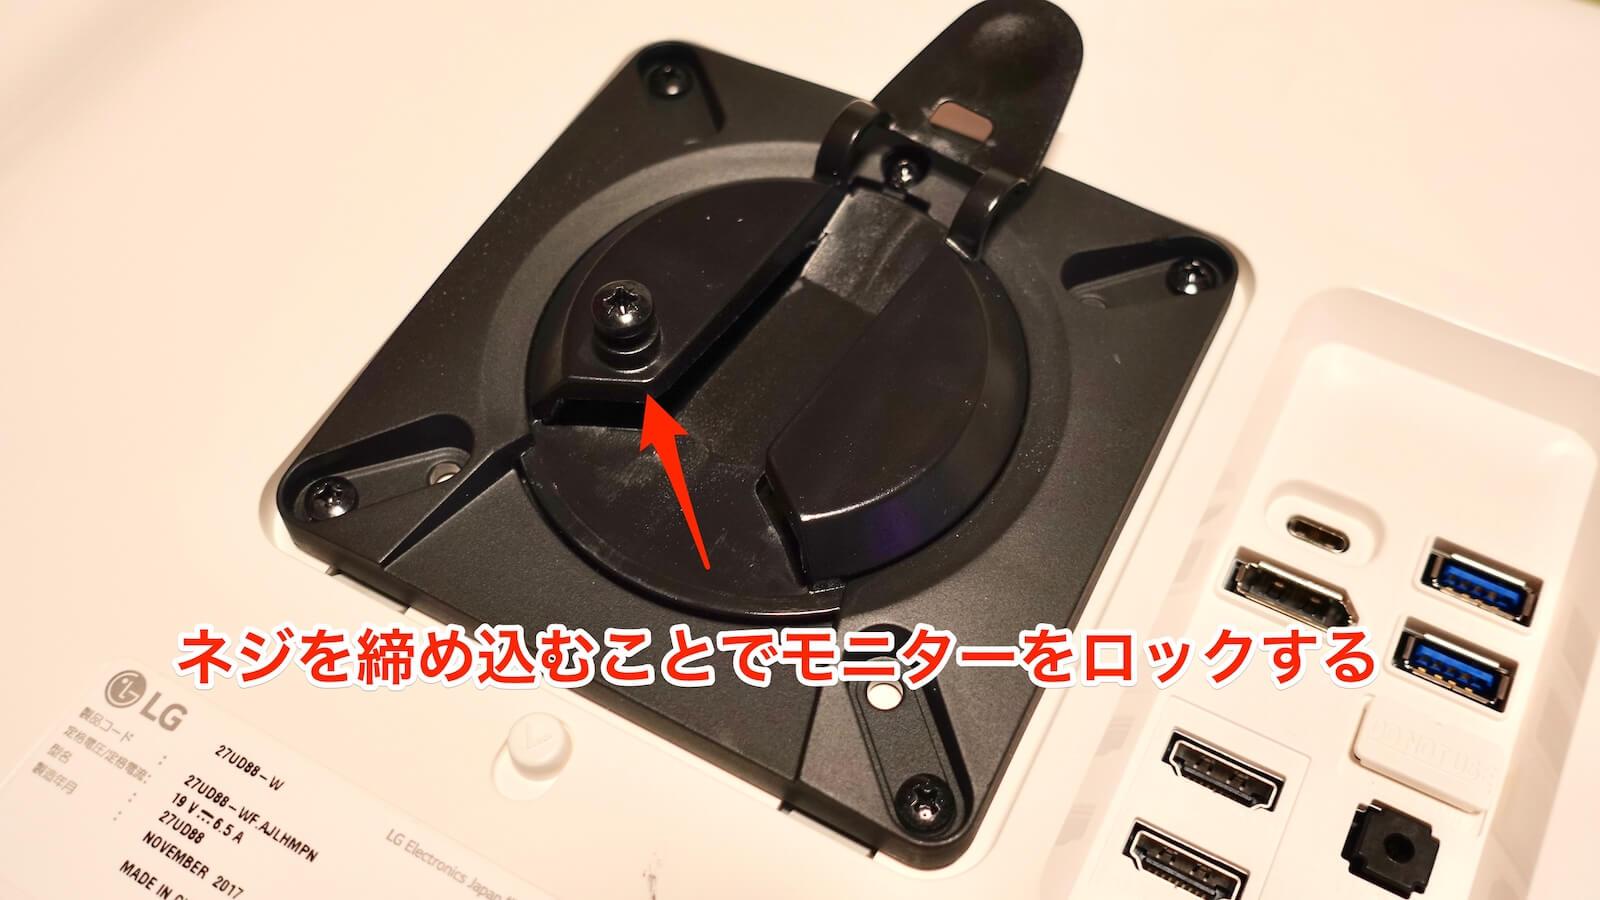 HermanMiller FLO monitor arm monitor fixing screw